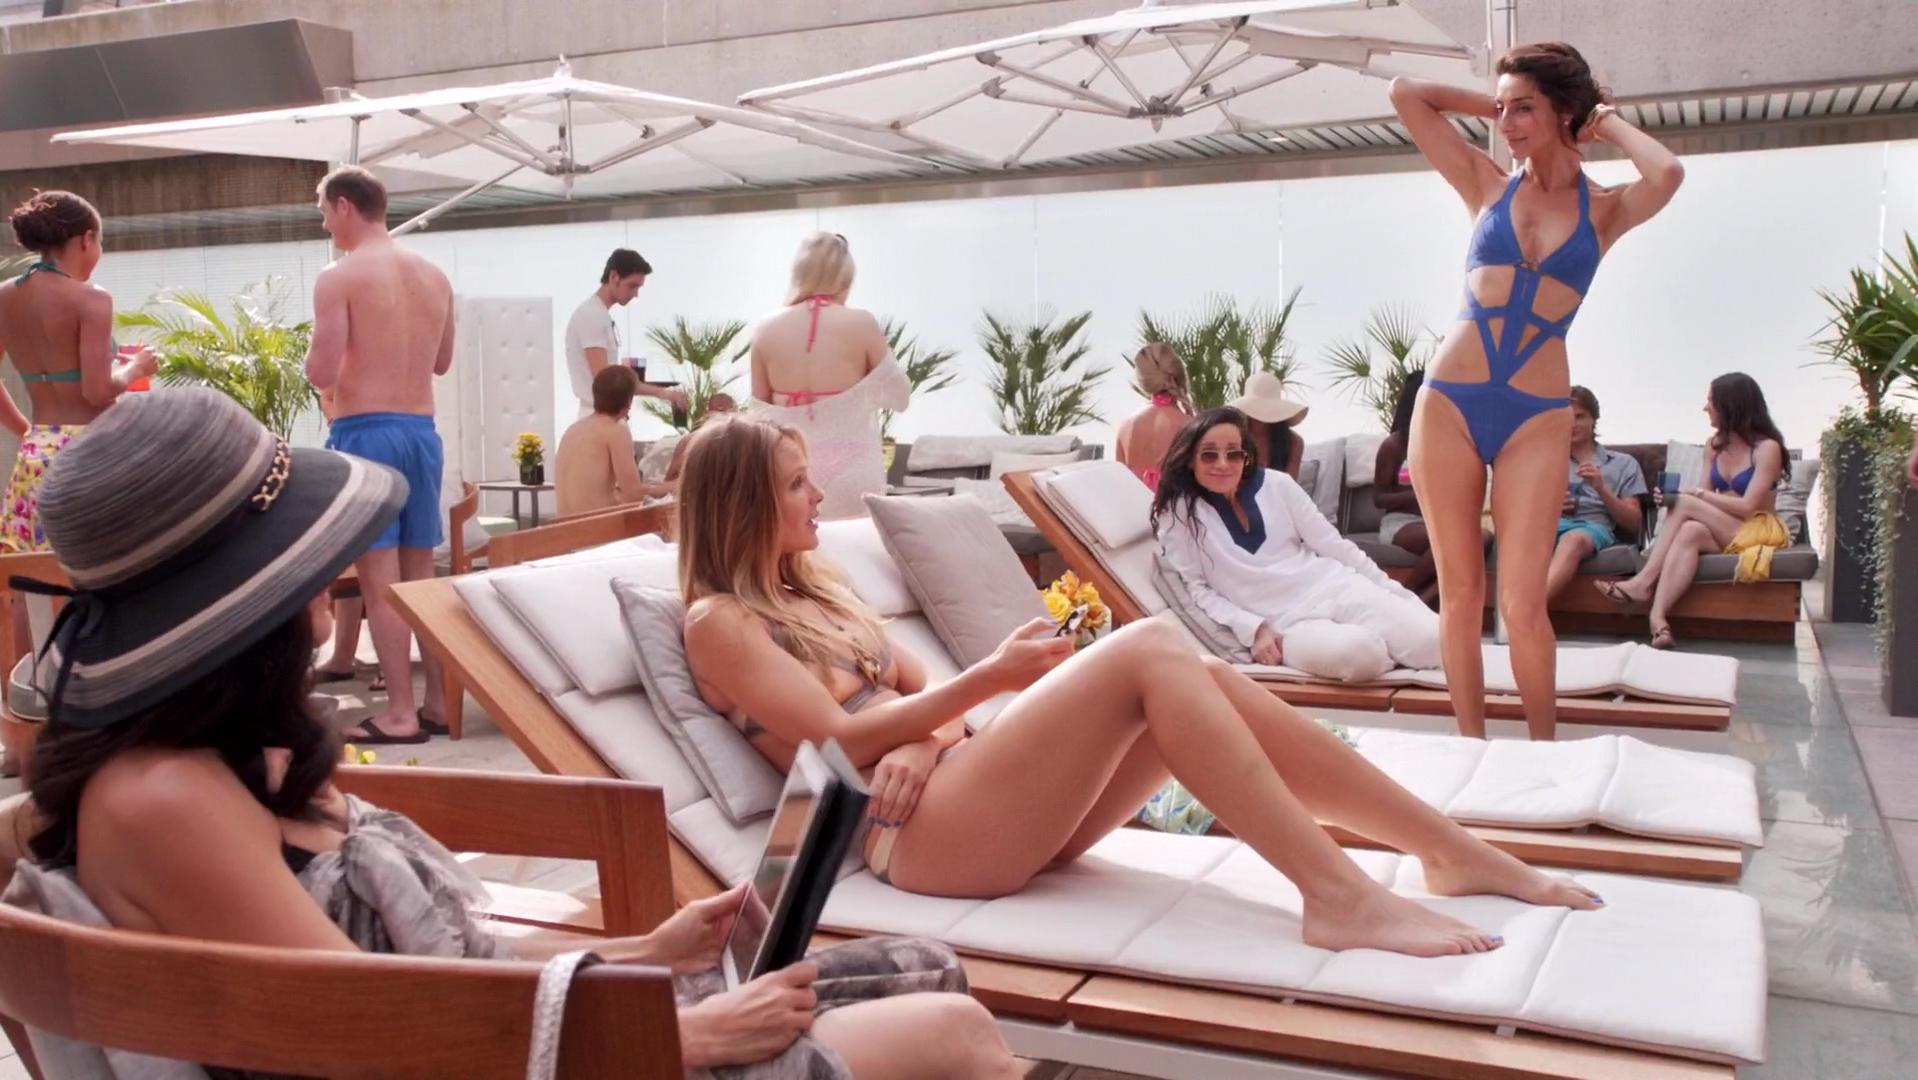 Beau Garrett sexy, Necar Zadegan sexy - Girlfriends' Guide to Divorce s01e01-07 (2014)